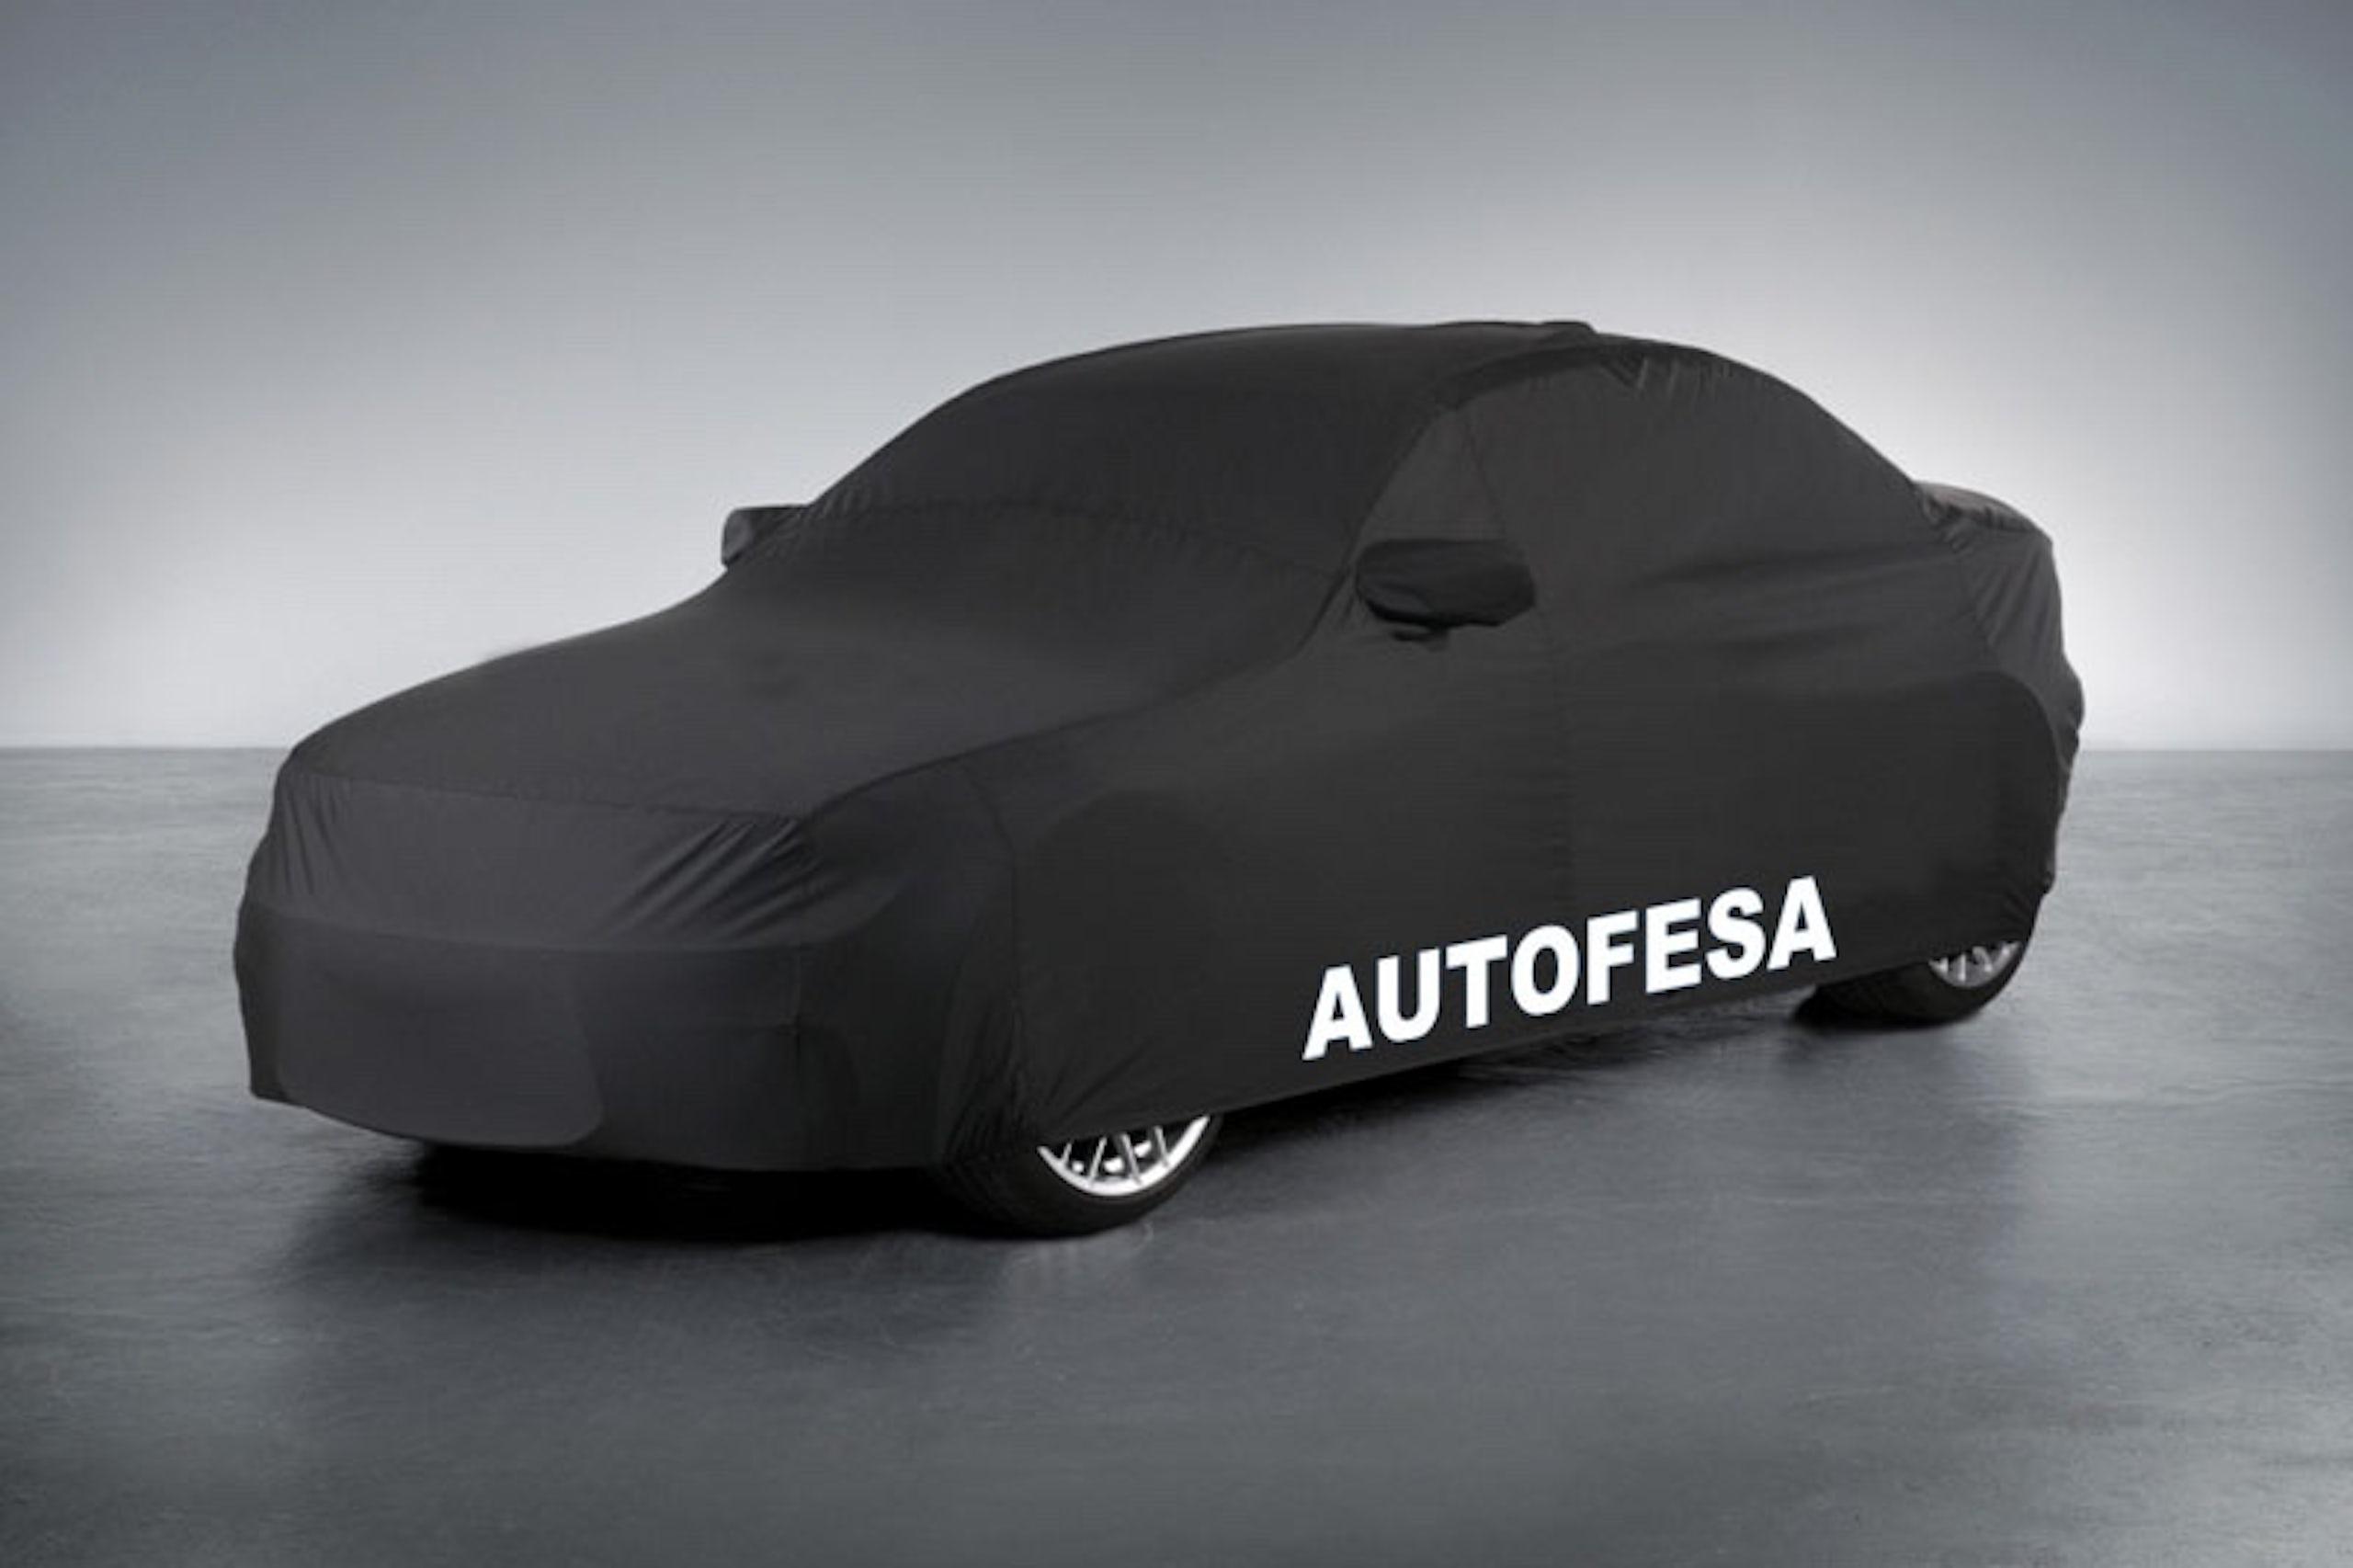 Lexus Nx 300h 300h 2.5 197cv Luxury 4WD 5p CVT Auto - Foto 34